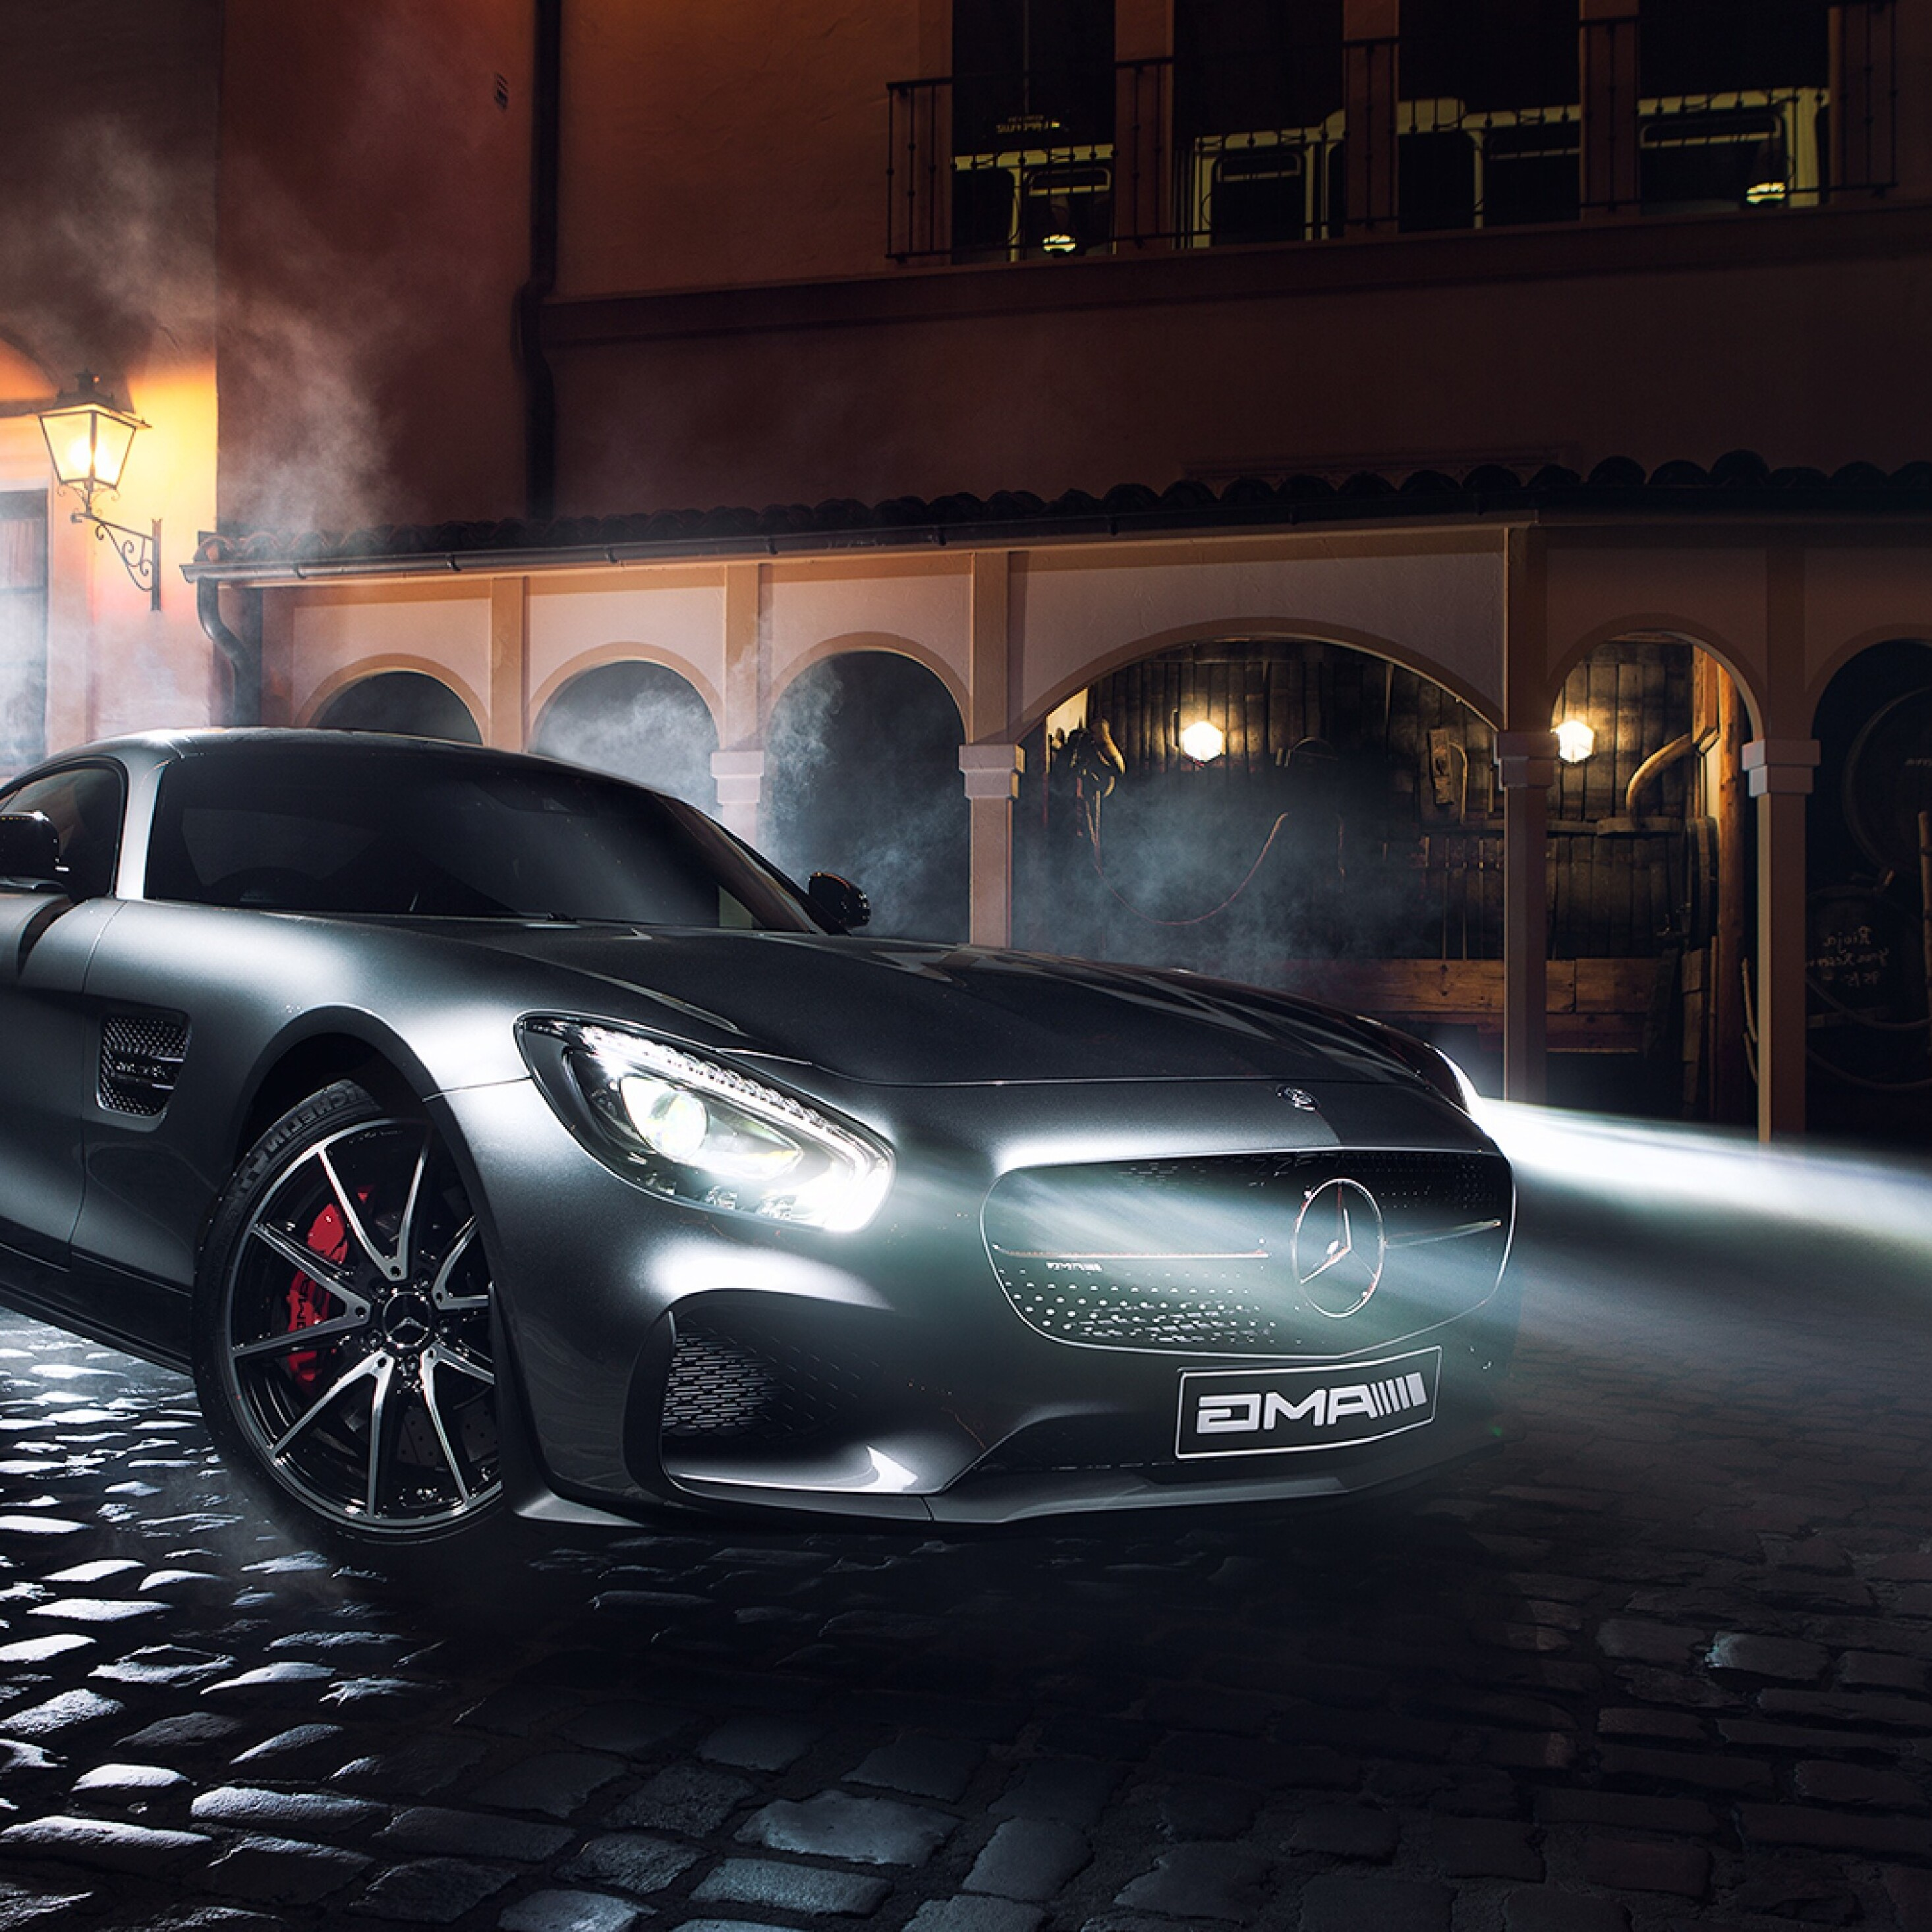 2932x2932 Mercedes Benz Amg GTS Ipad Pro Retina Display HD